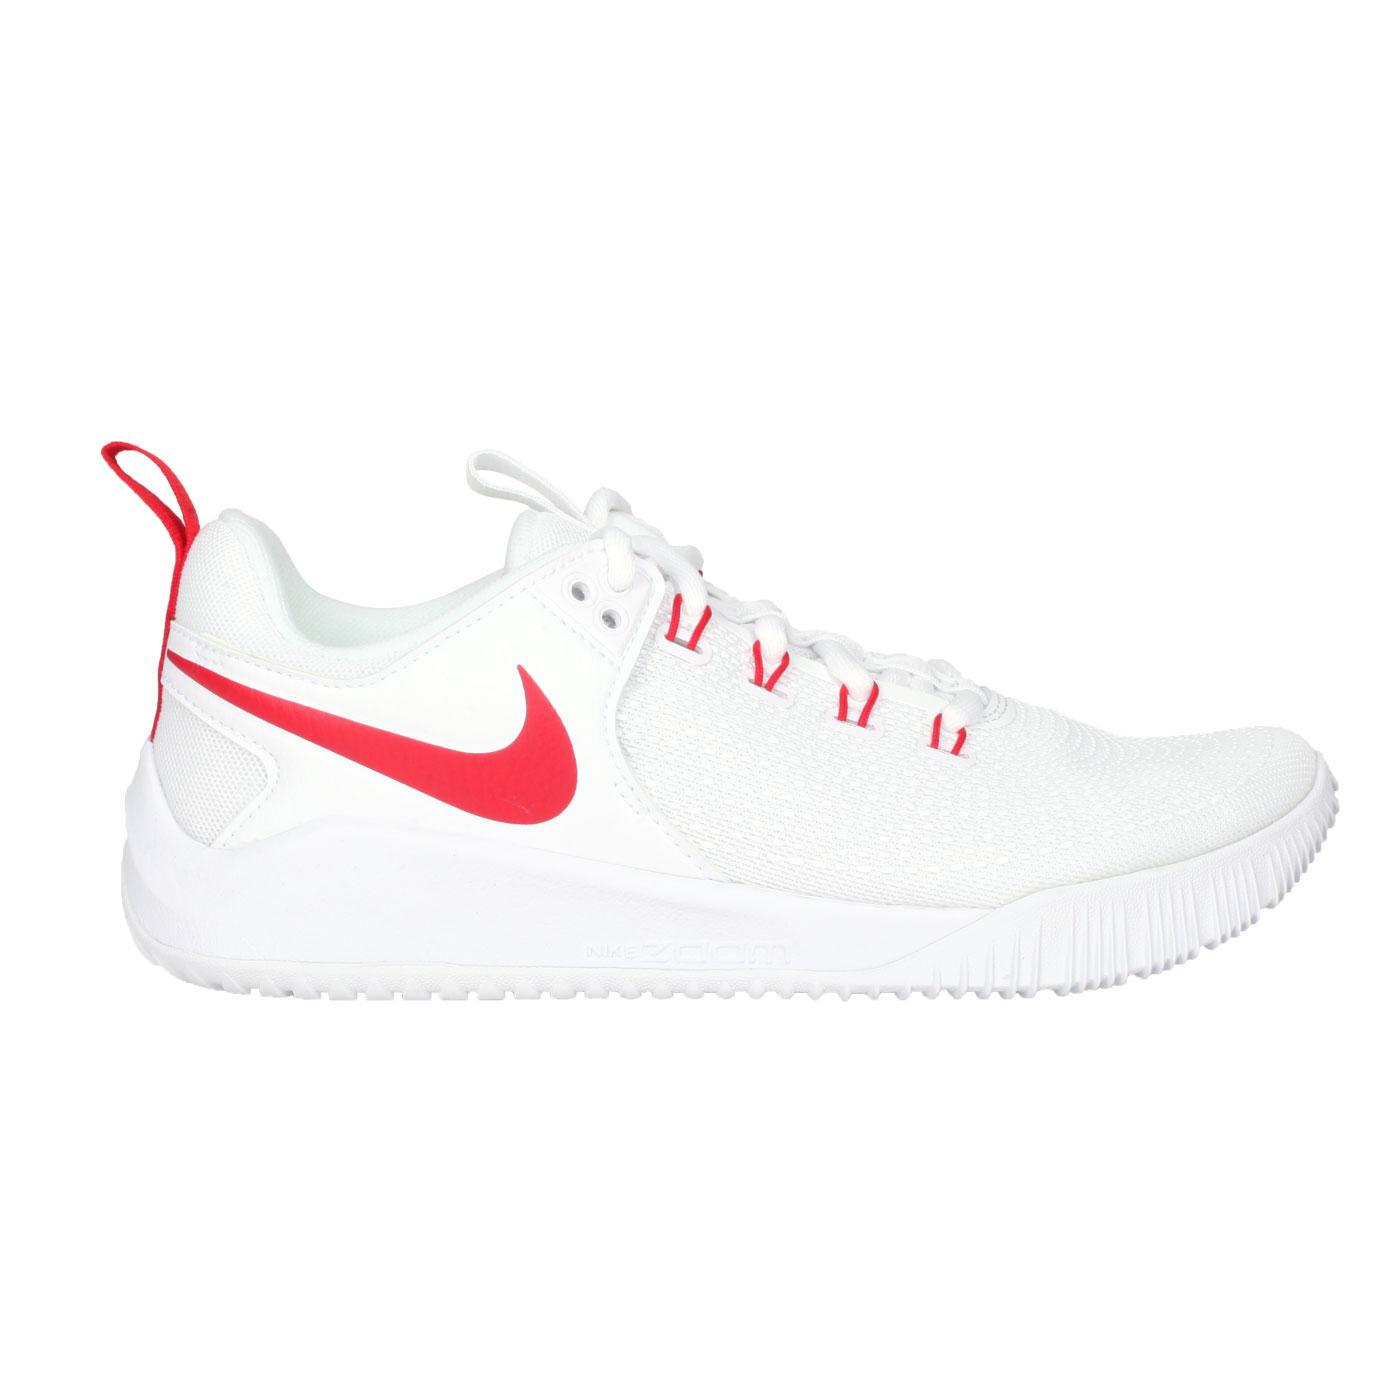 NIKE 排球鞋  @WMNS ZOOM HYPERACE 2@AA0286106 - 白紅